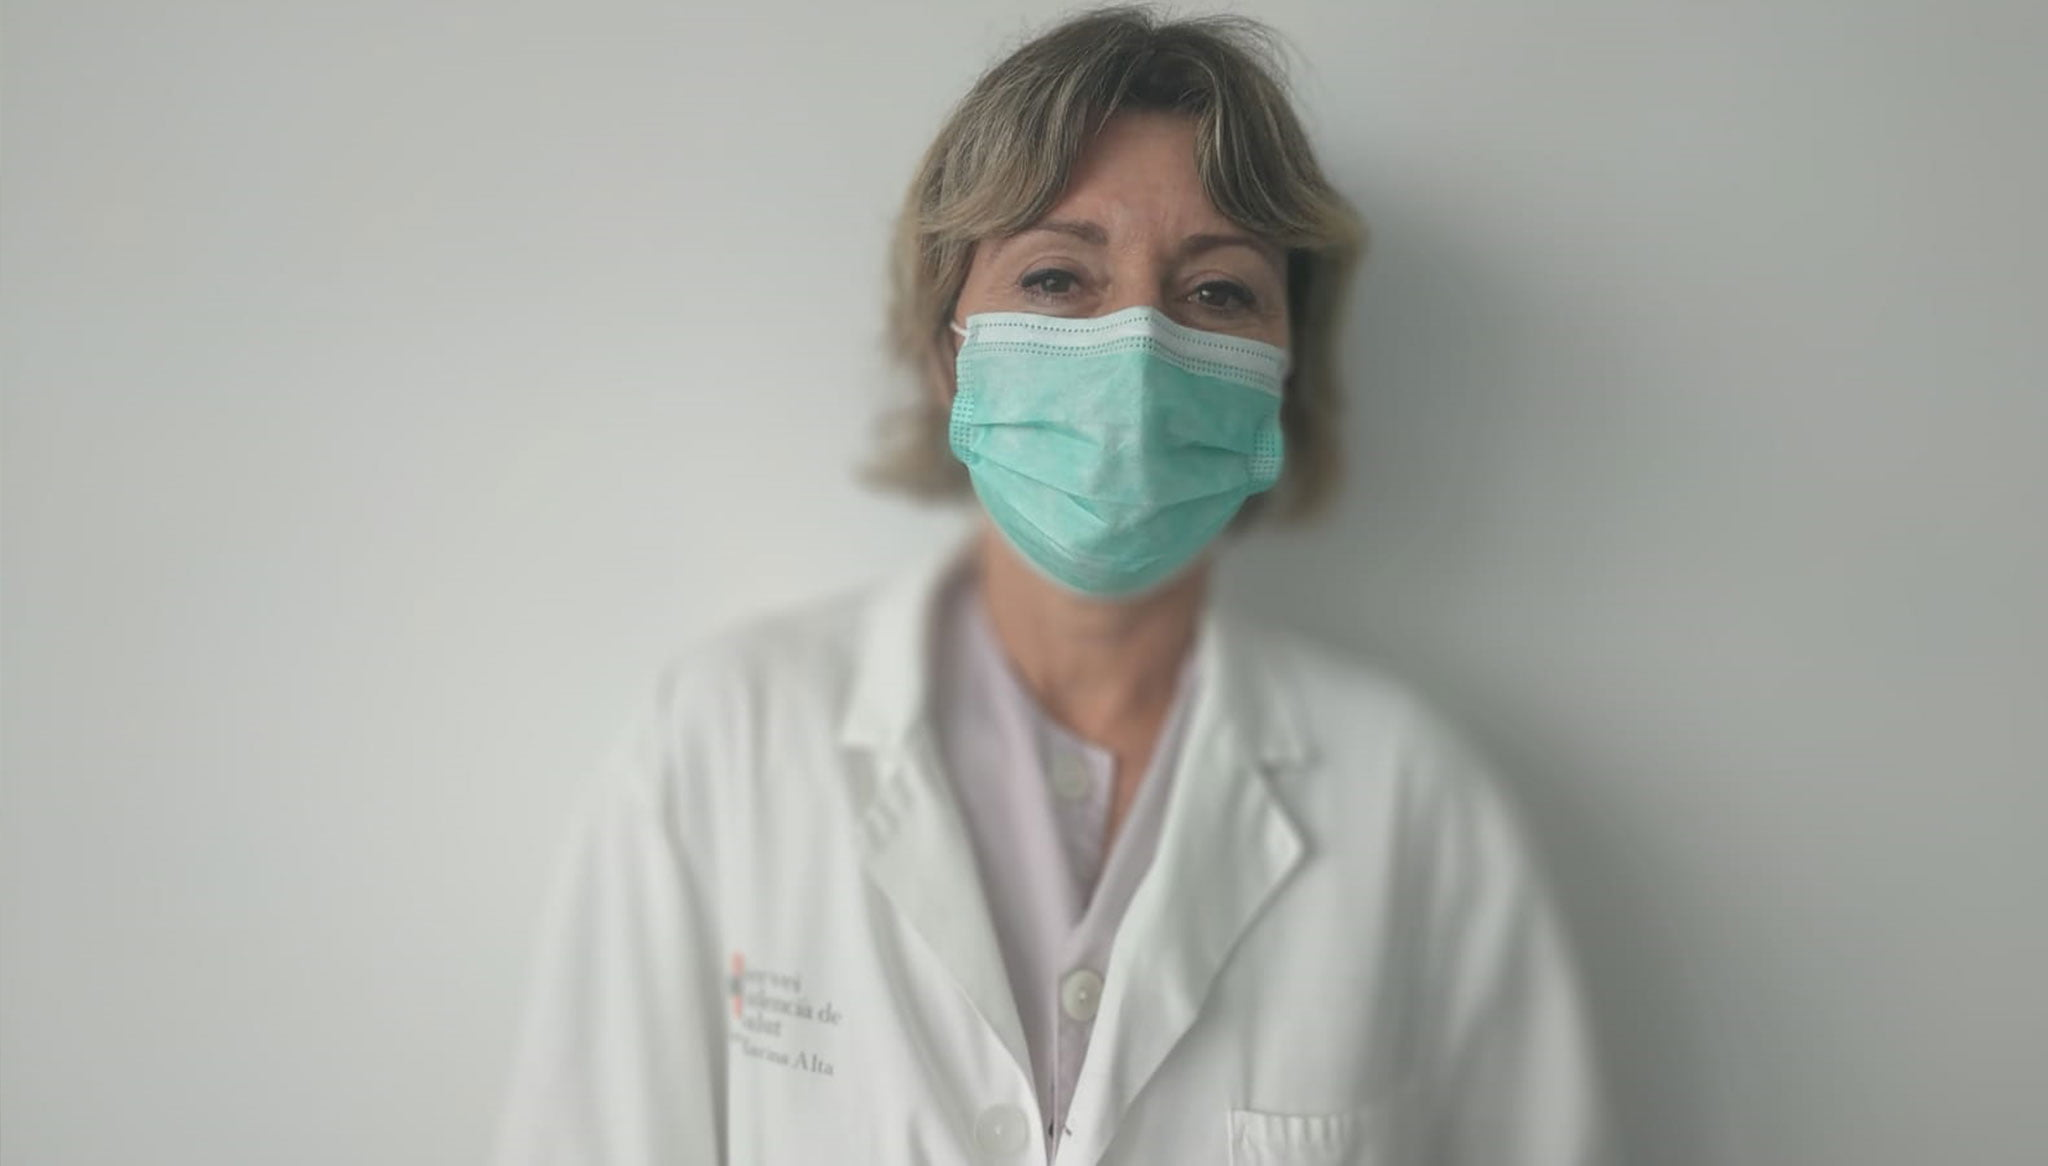 Elena Ortega, midwife of the Dénia Health Department